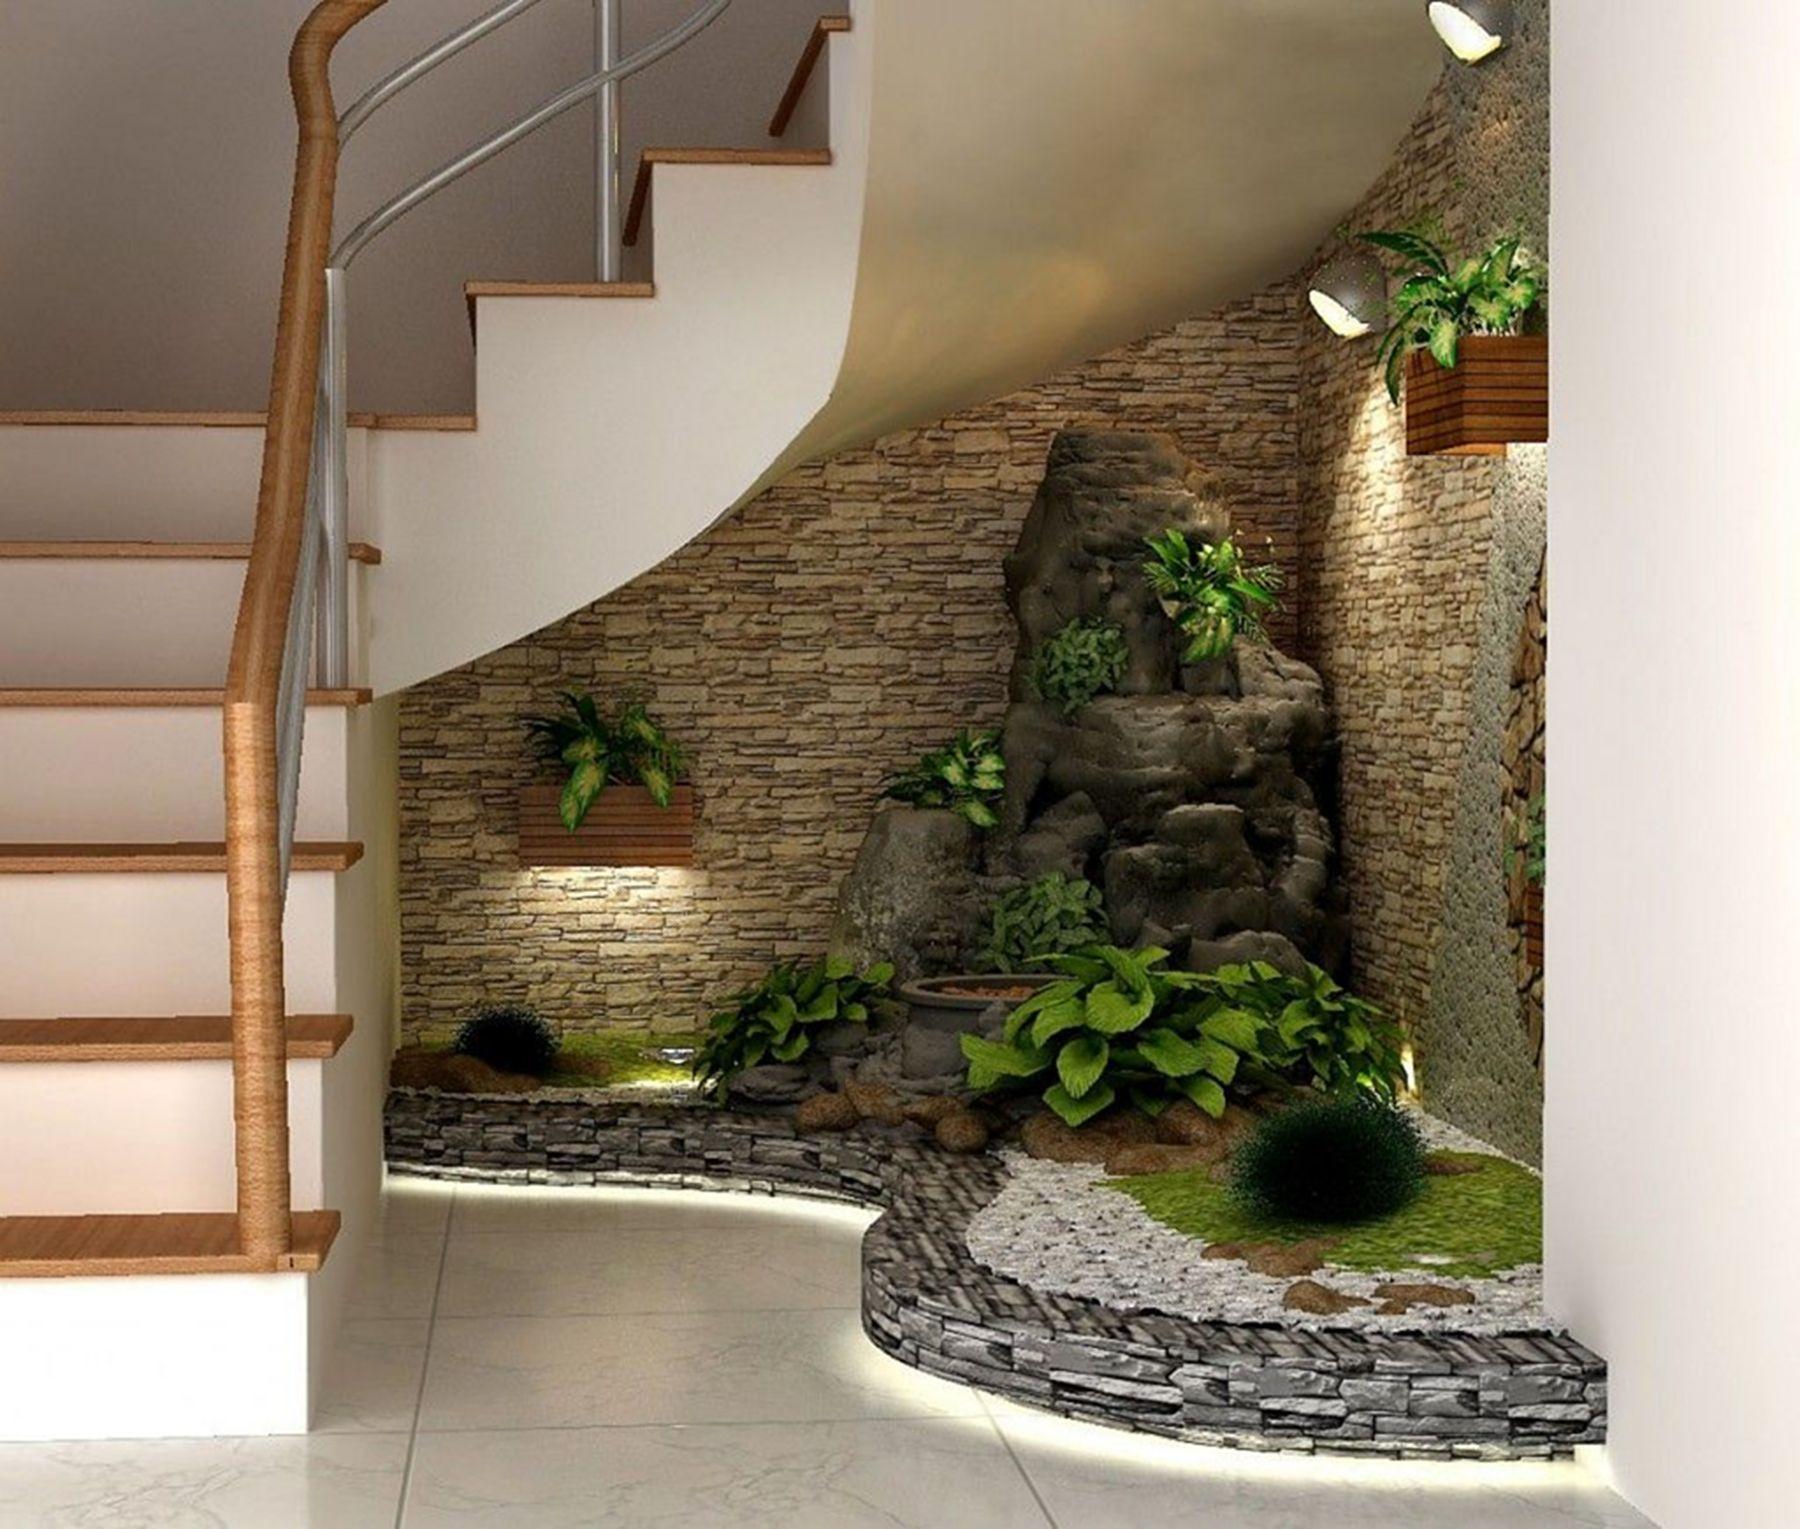 15+ Beautiful Garden Design Ideas Indoors To Refresh Your